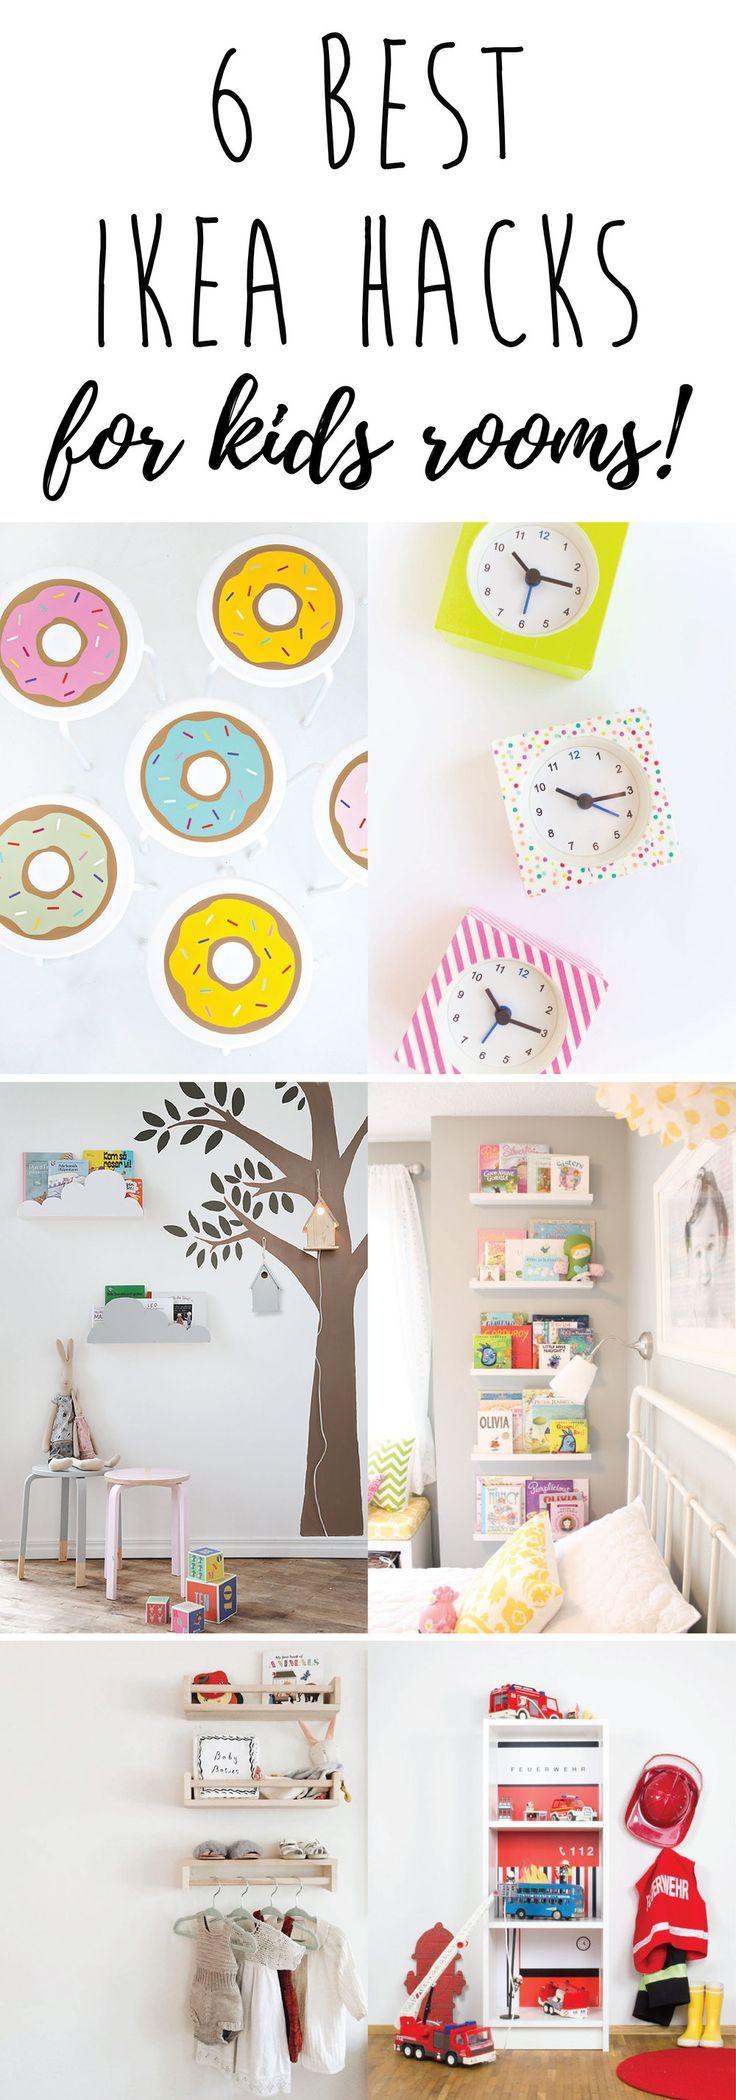 6 best ikea hacks for kids rooms playroom pinterest ni os habitaciones ni a and - Ikea almacenamiento ninos ...